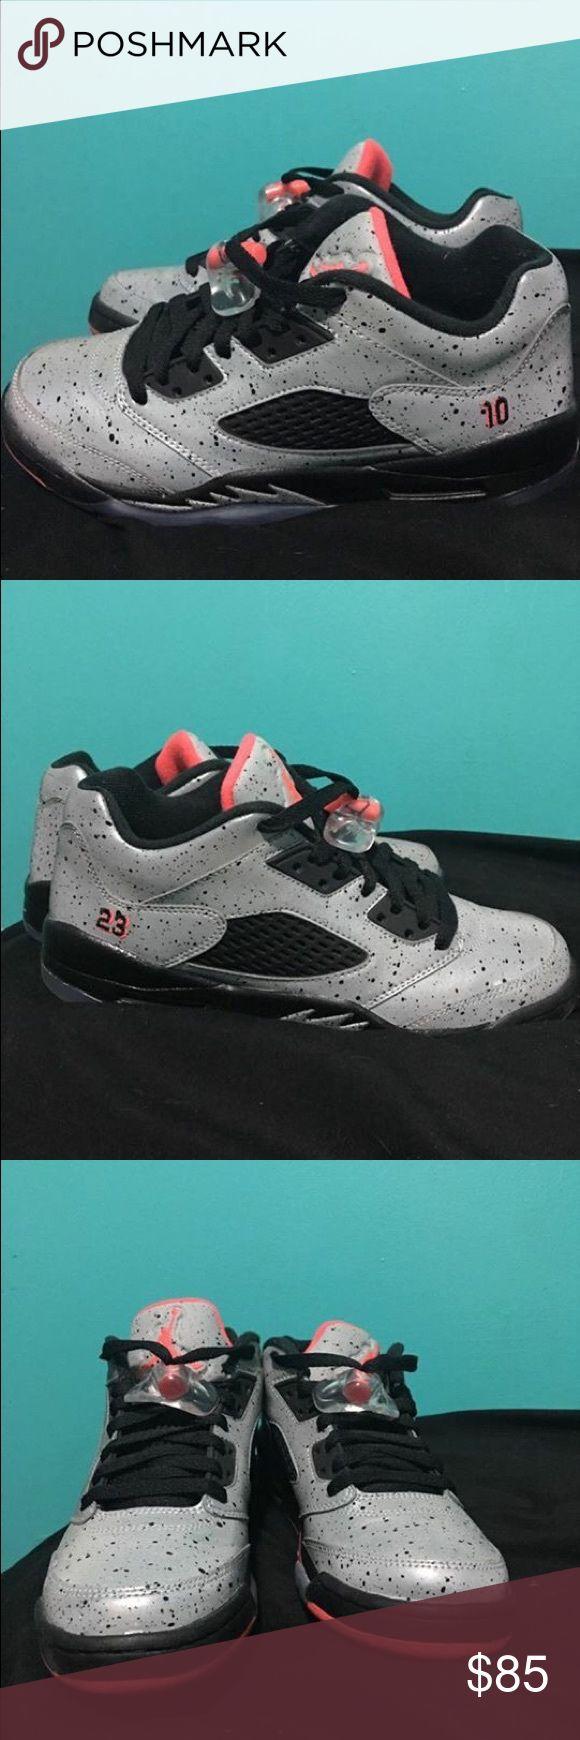 Air Jordan Neymar low 5 kids Jordan 5 rare release. Size 6Y but can fit a women's 8. Jordan Shoes Sneakers